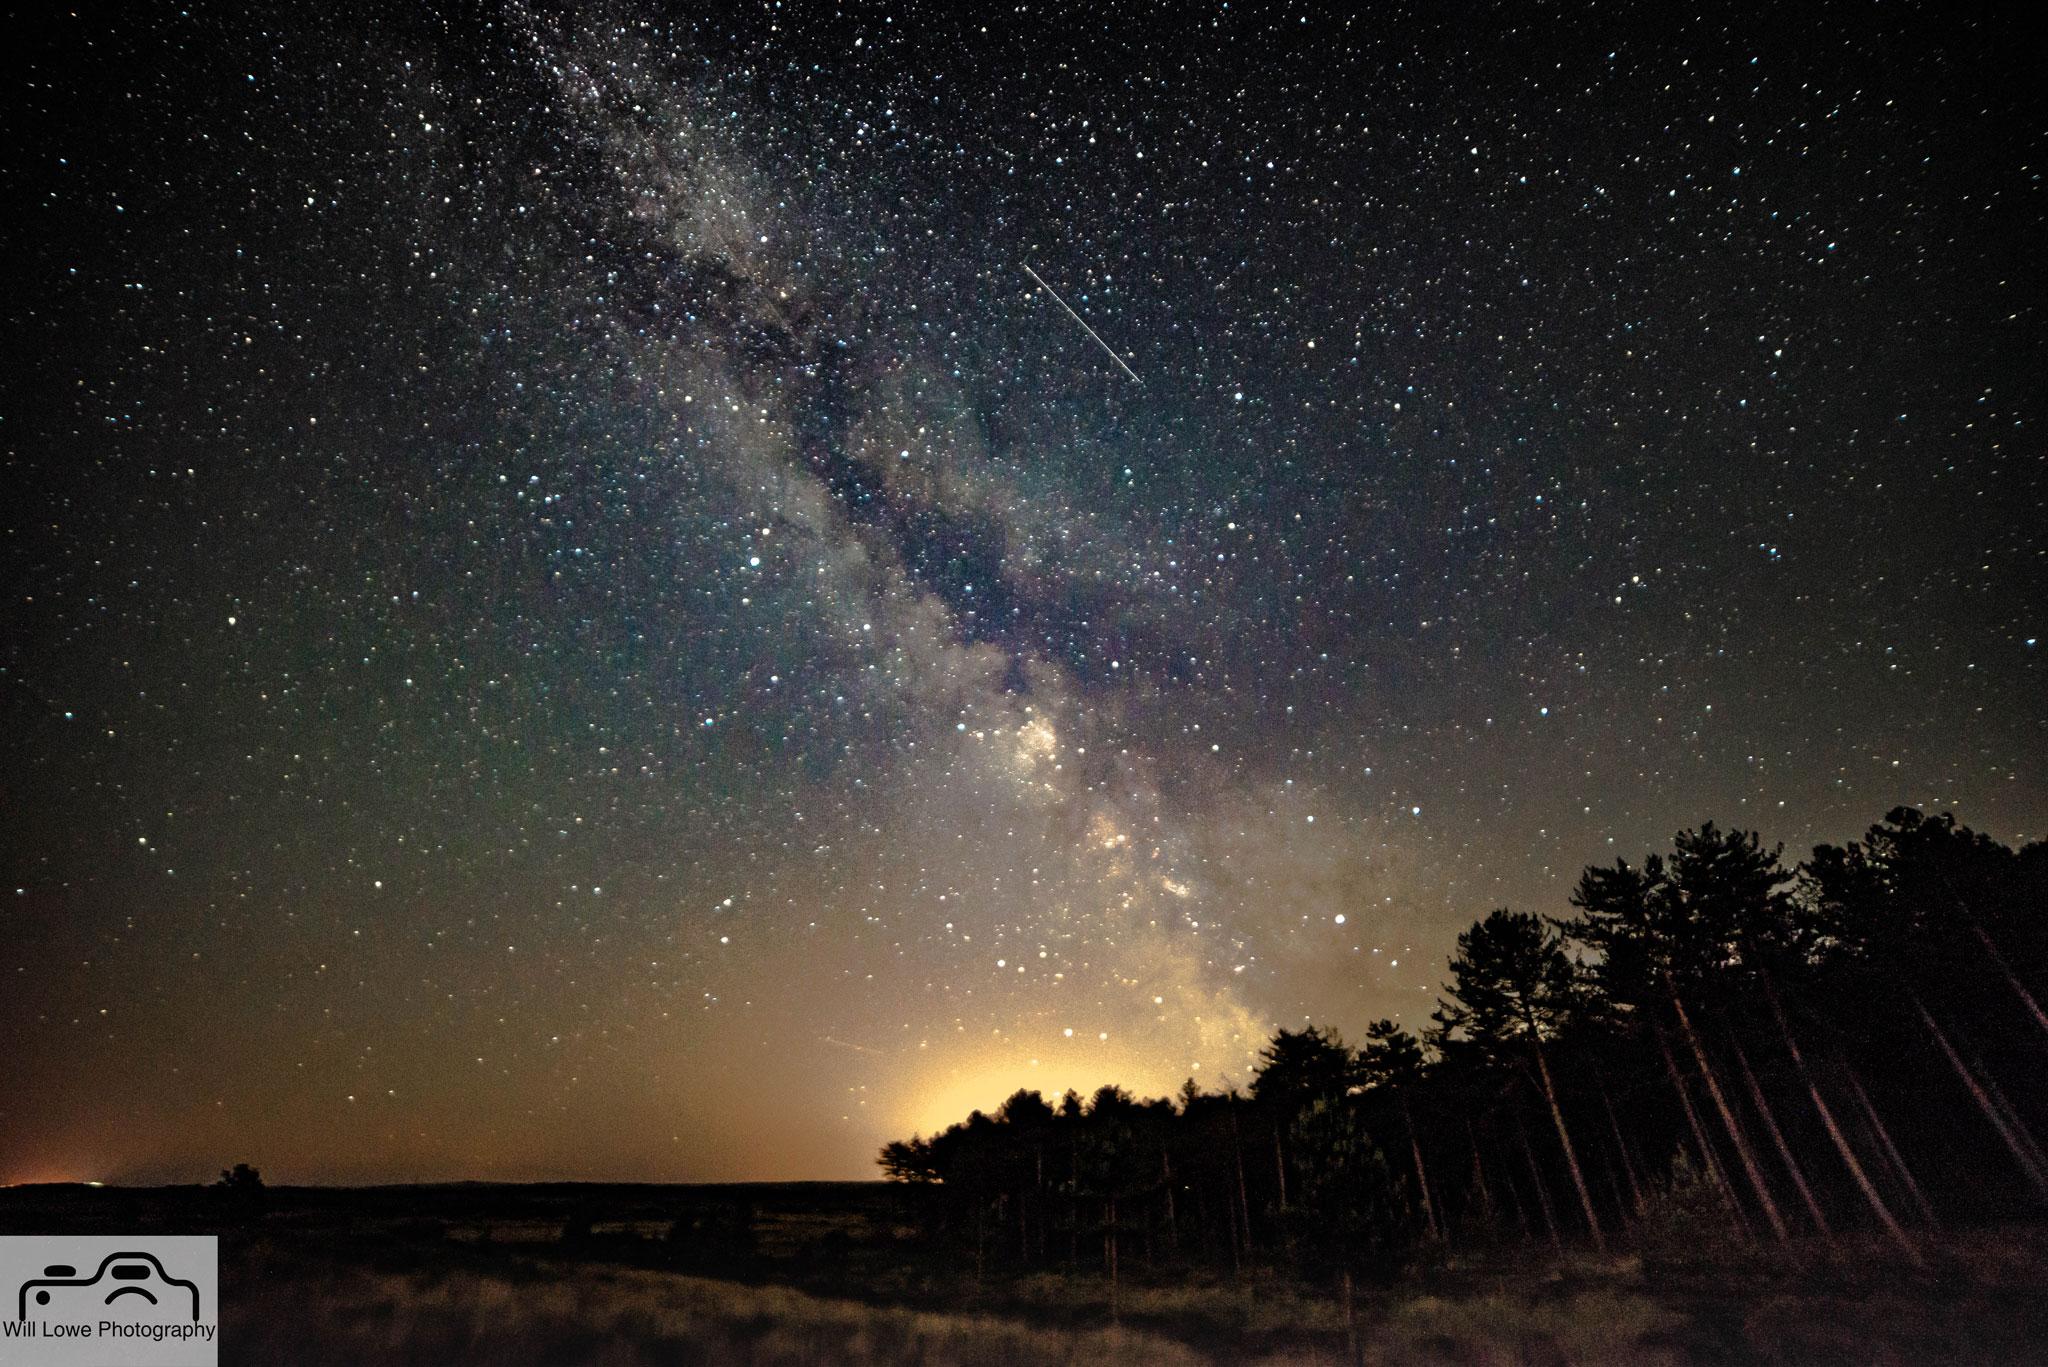 Milky Way over Studland Treeline